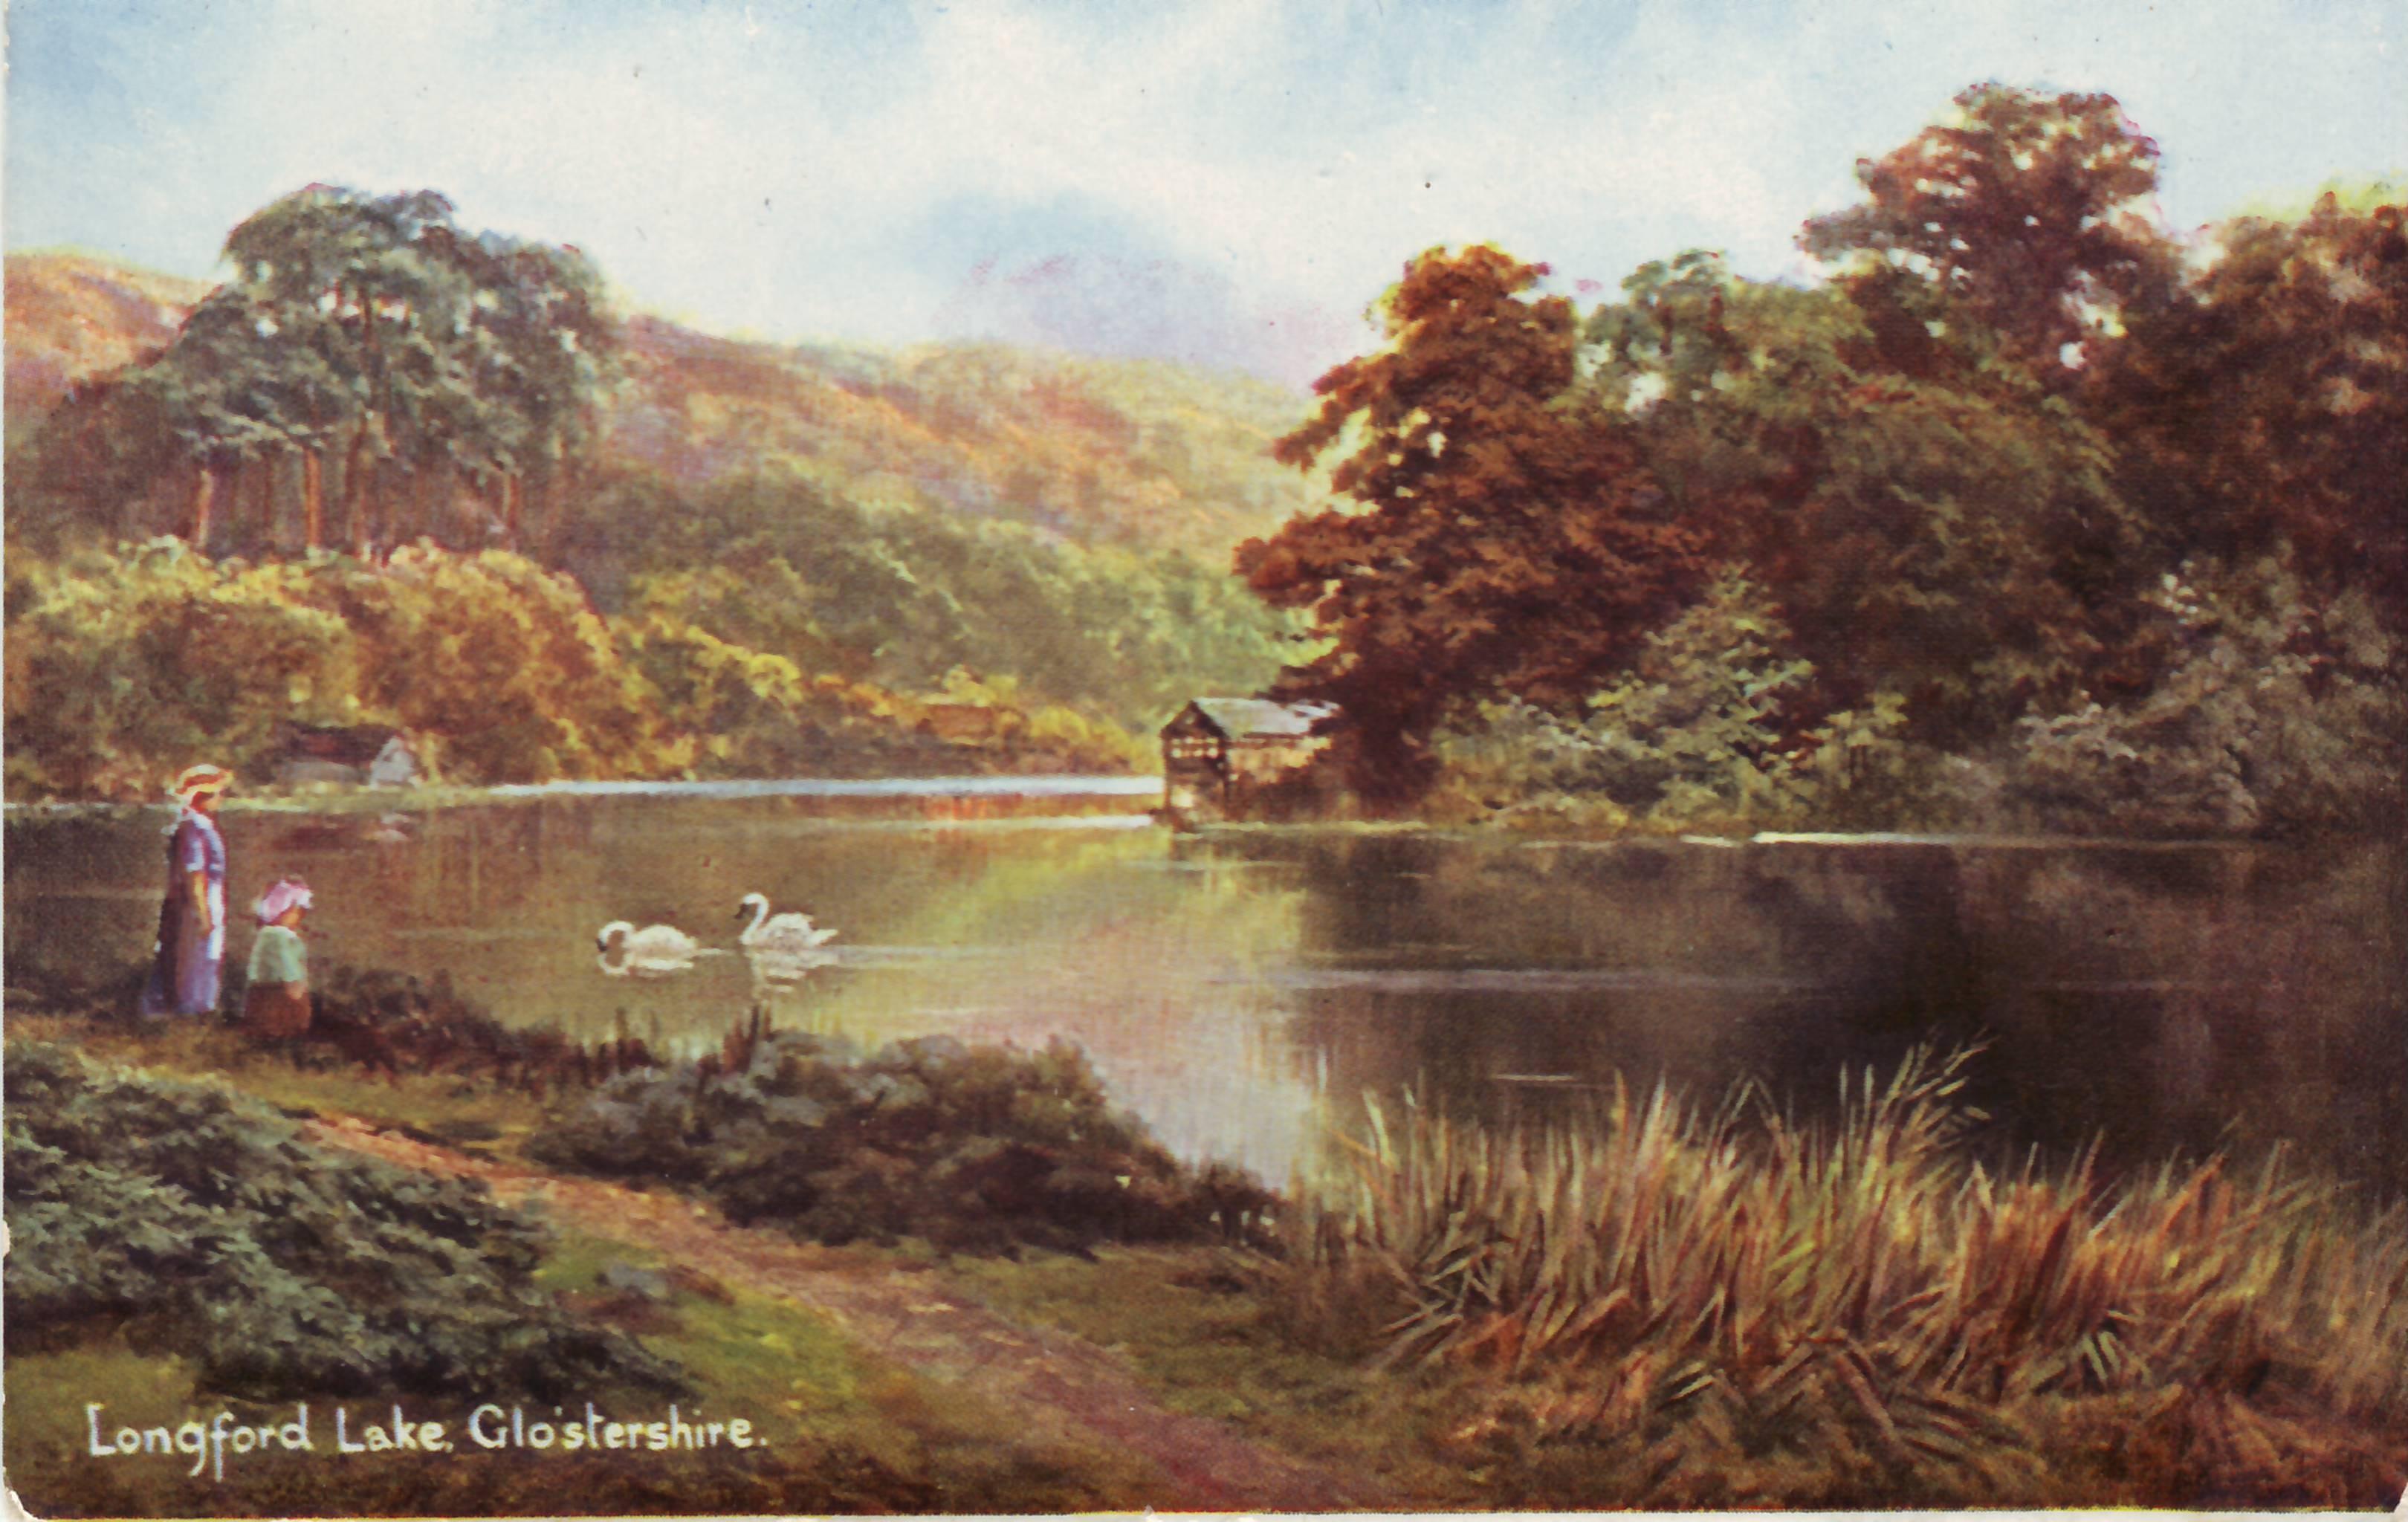 Longford Lake